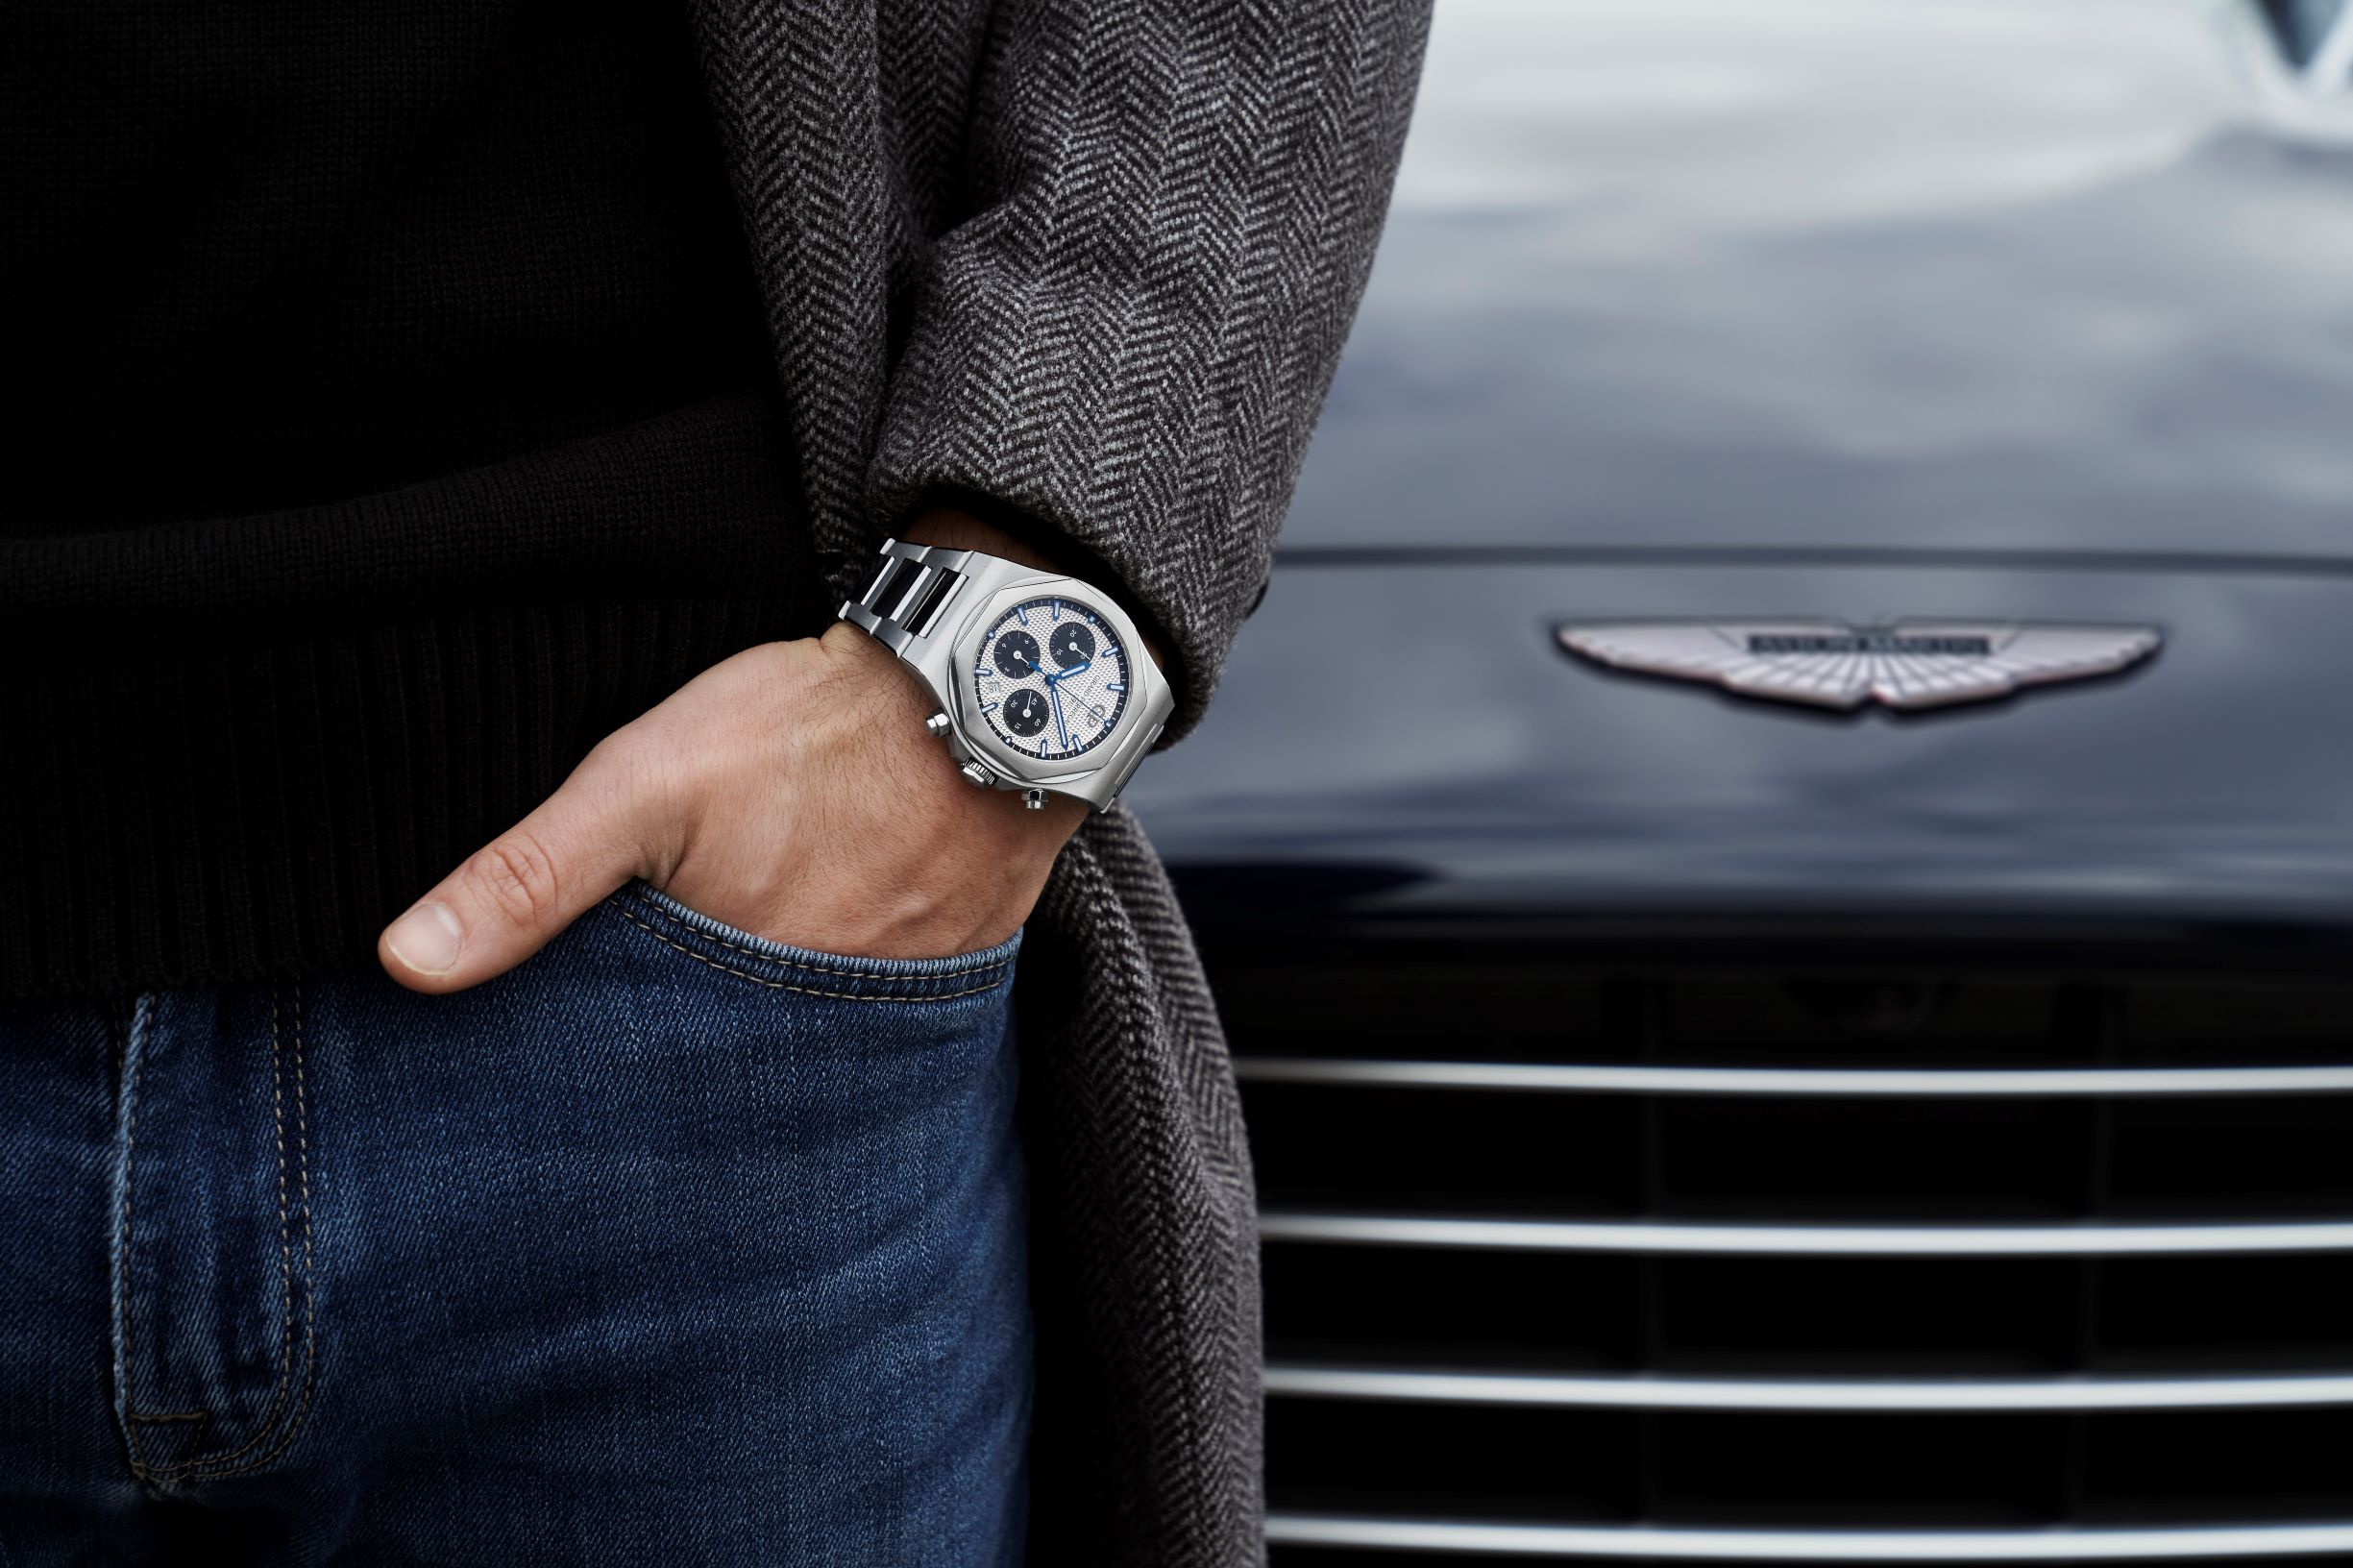 Laureato Chronograph Steel 2 & Aston Martin